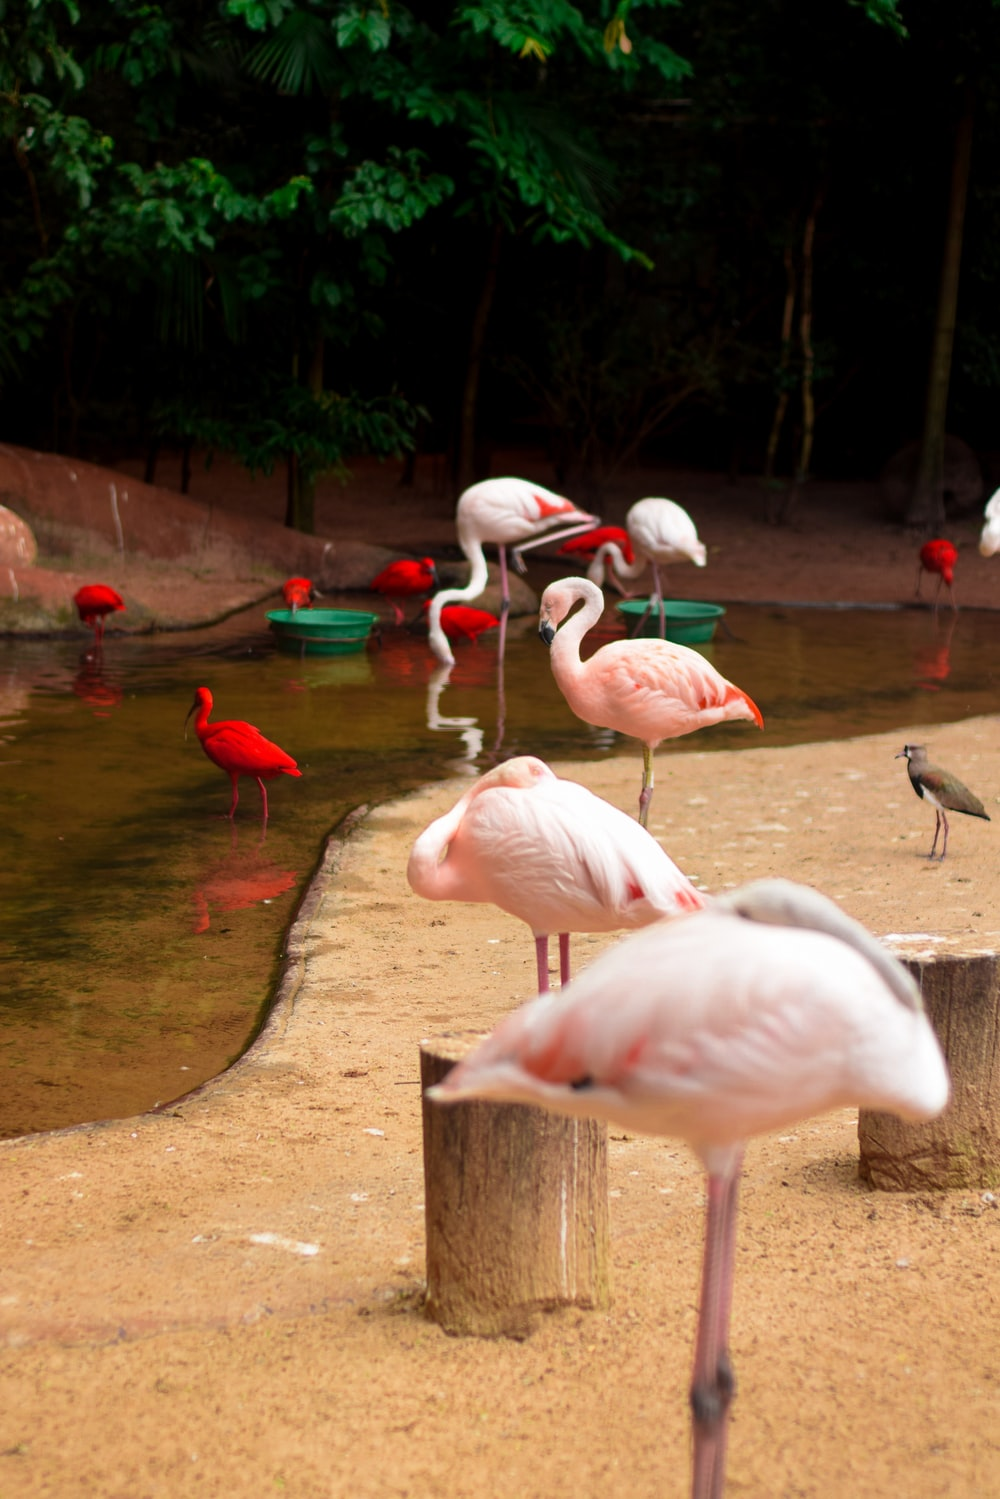 flamingos near body of water